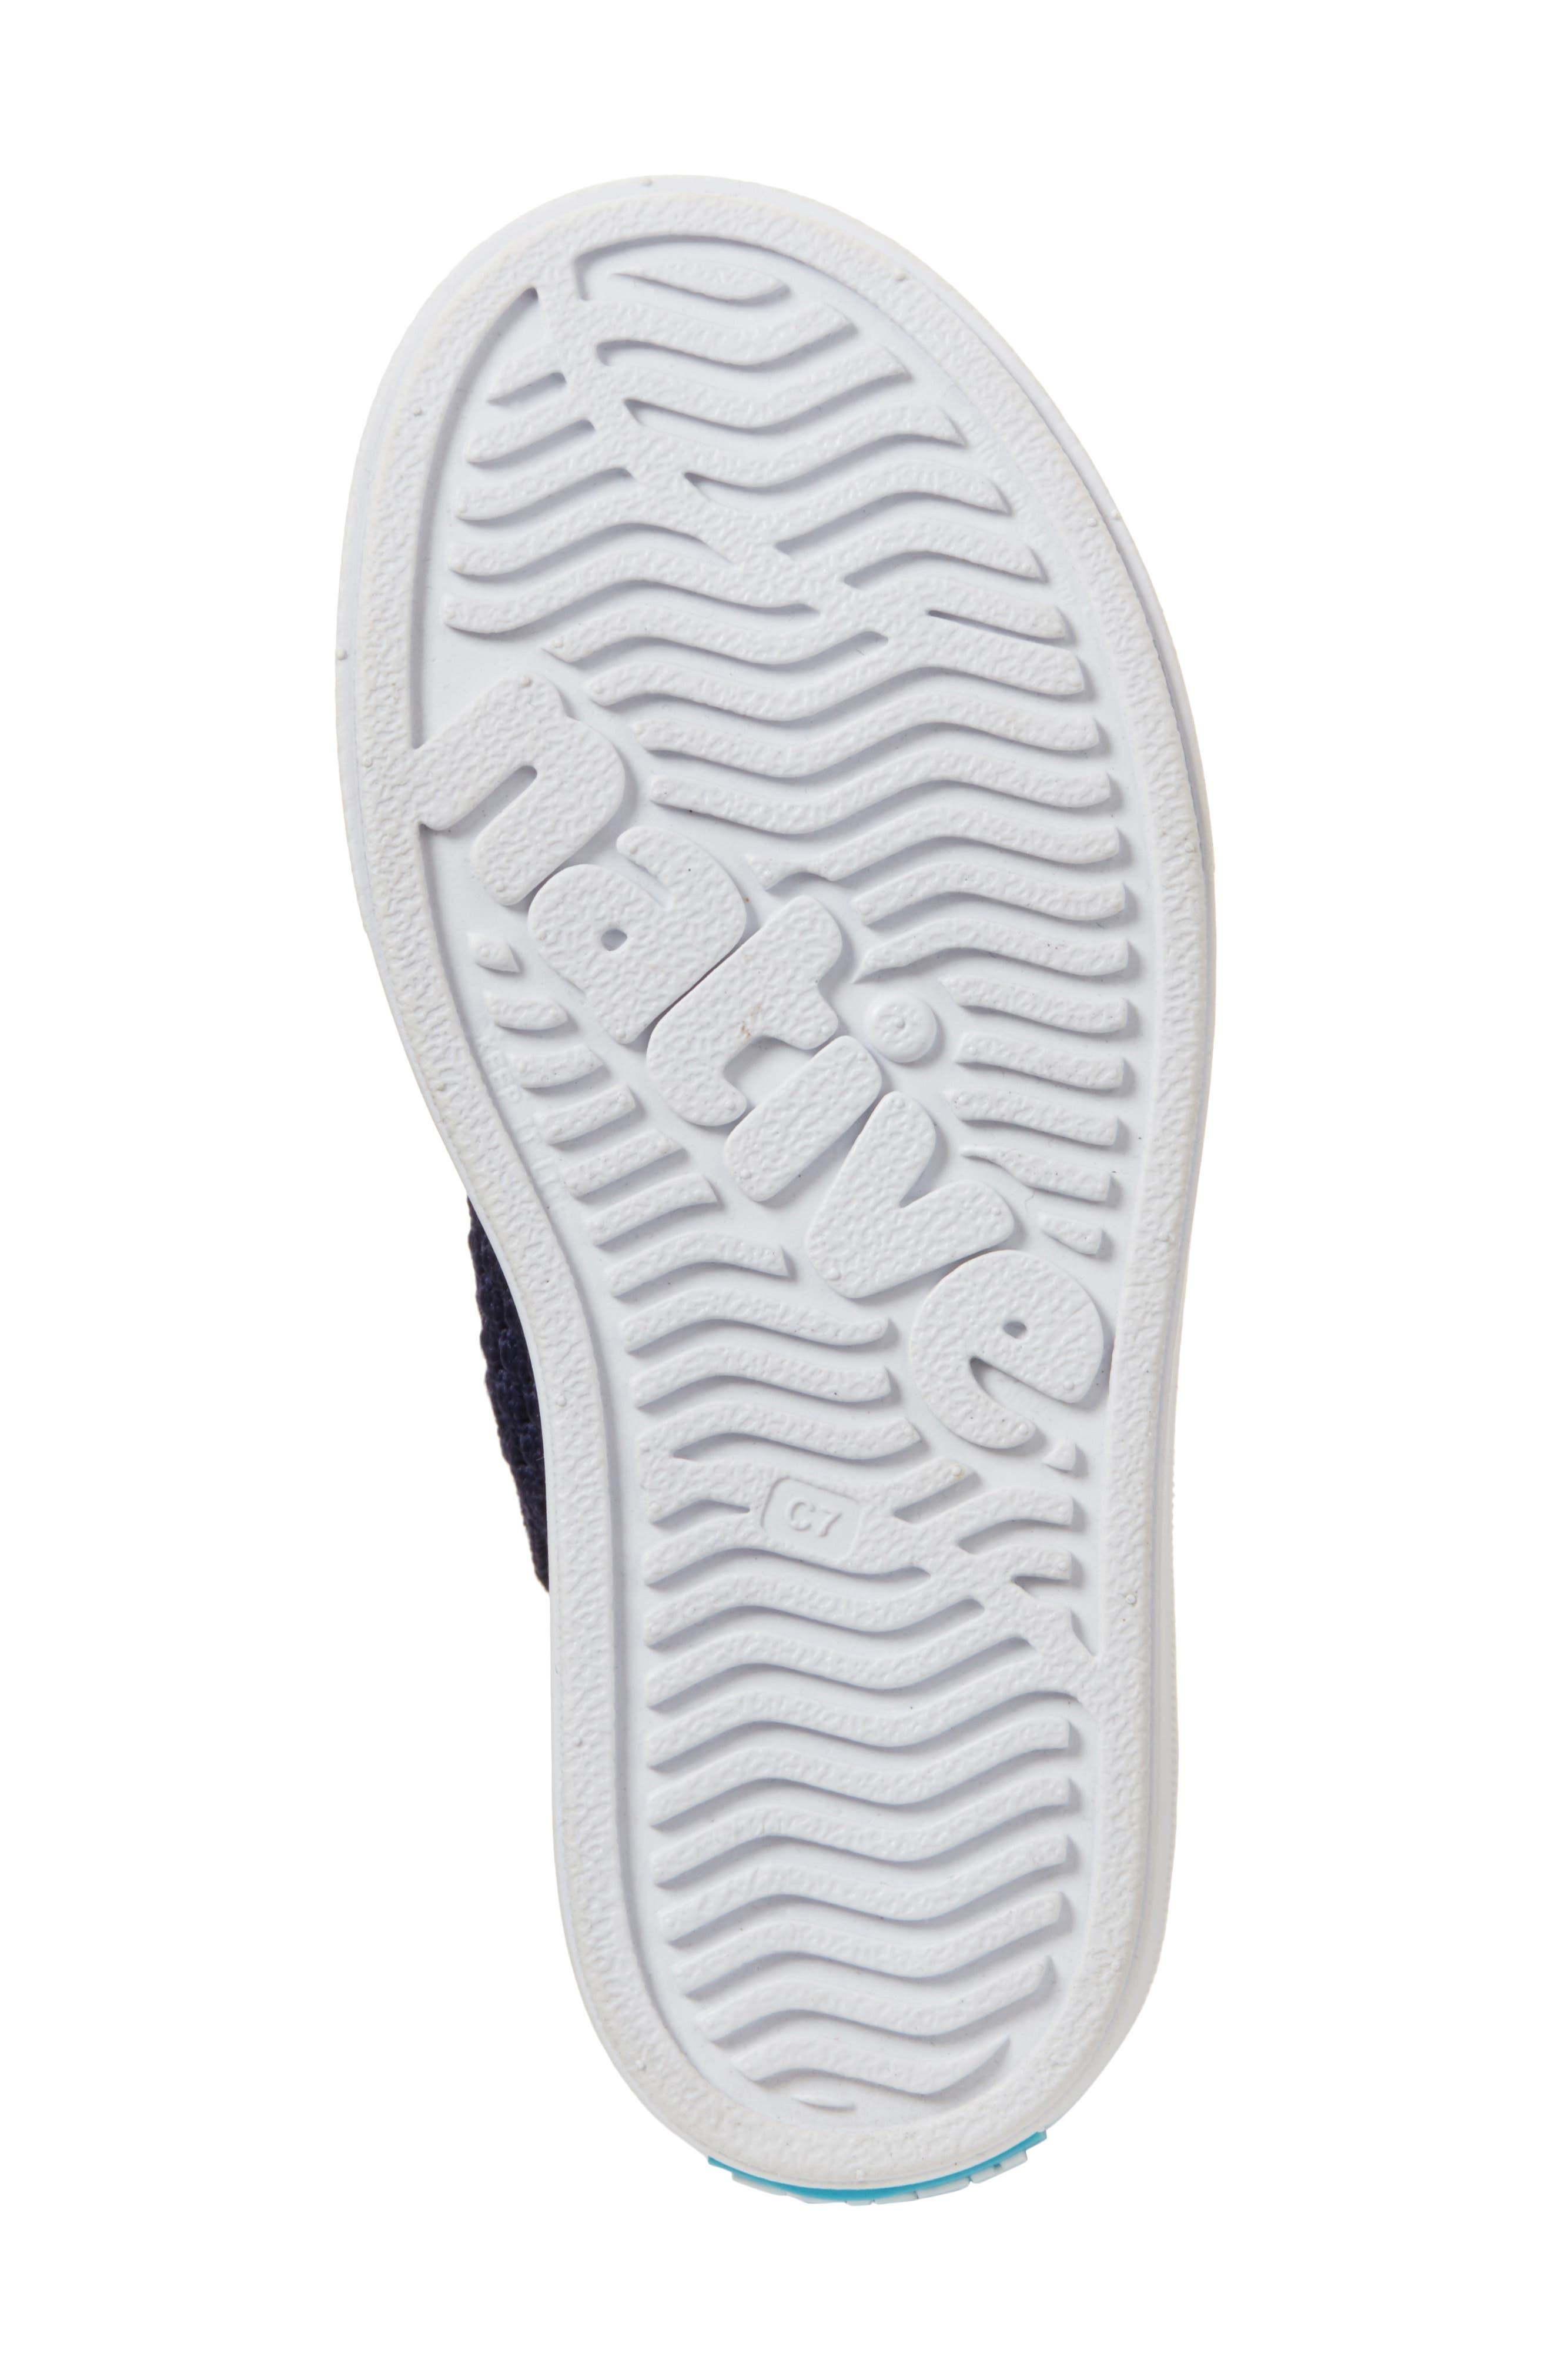 Native Jefferson 2.0 LiteKnit Sneaker,                             Alternate thumbnail 6, color,                             REGATTA BLUE/ SHELL WHITE